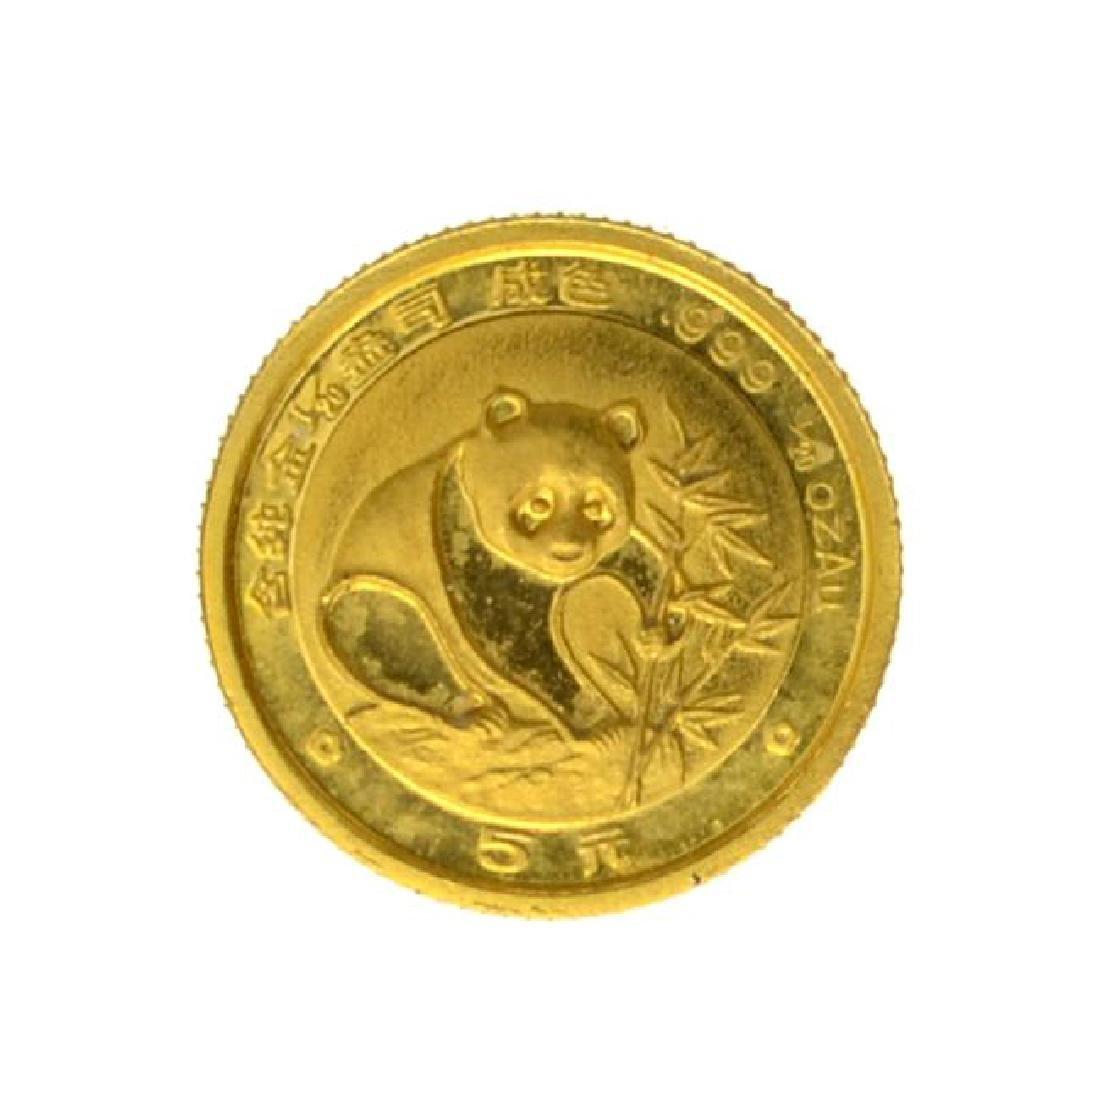 1988 1/20th Small Date Gold Panda 5 Yuan Coin (JG PS)